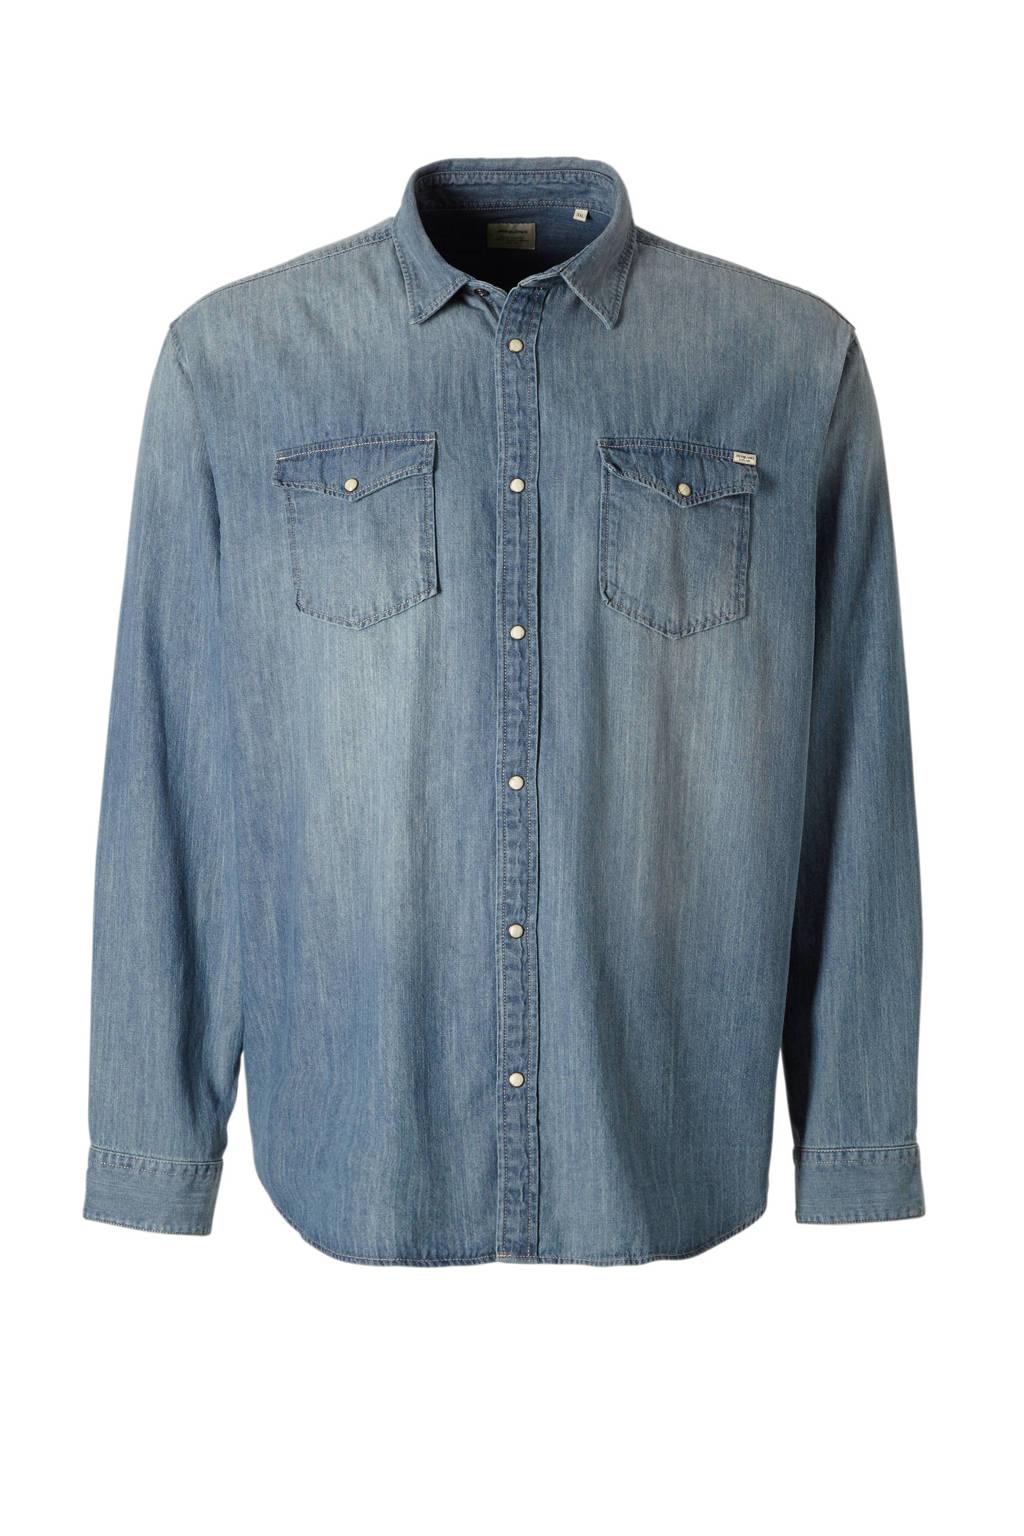 JACK & JONES PLUS SIZE regular fit overhemd blue denim, Blue denim